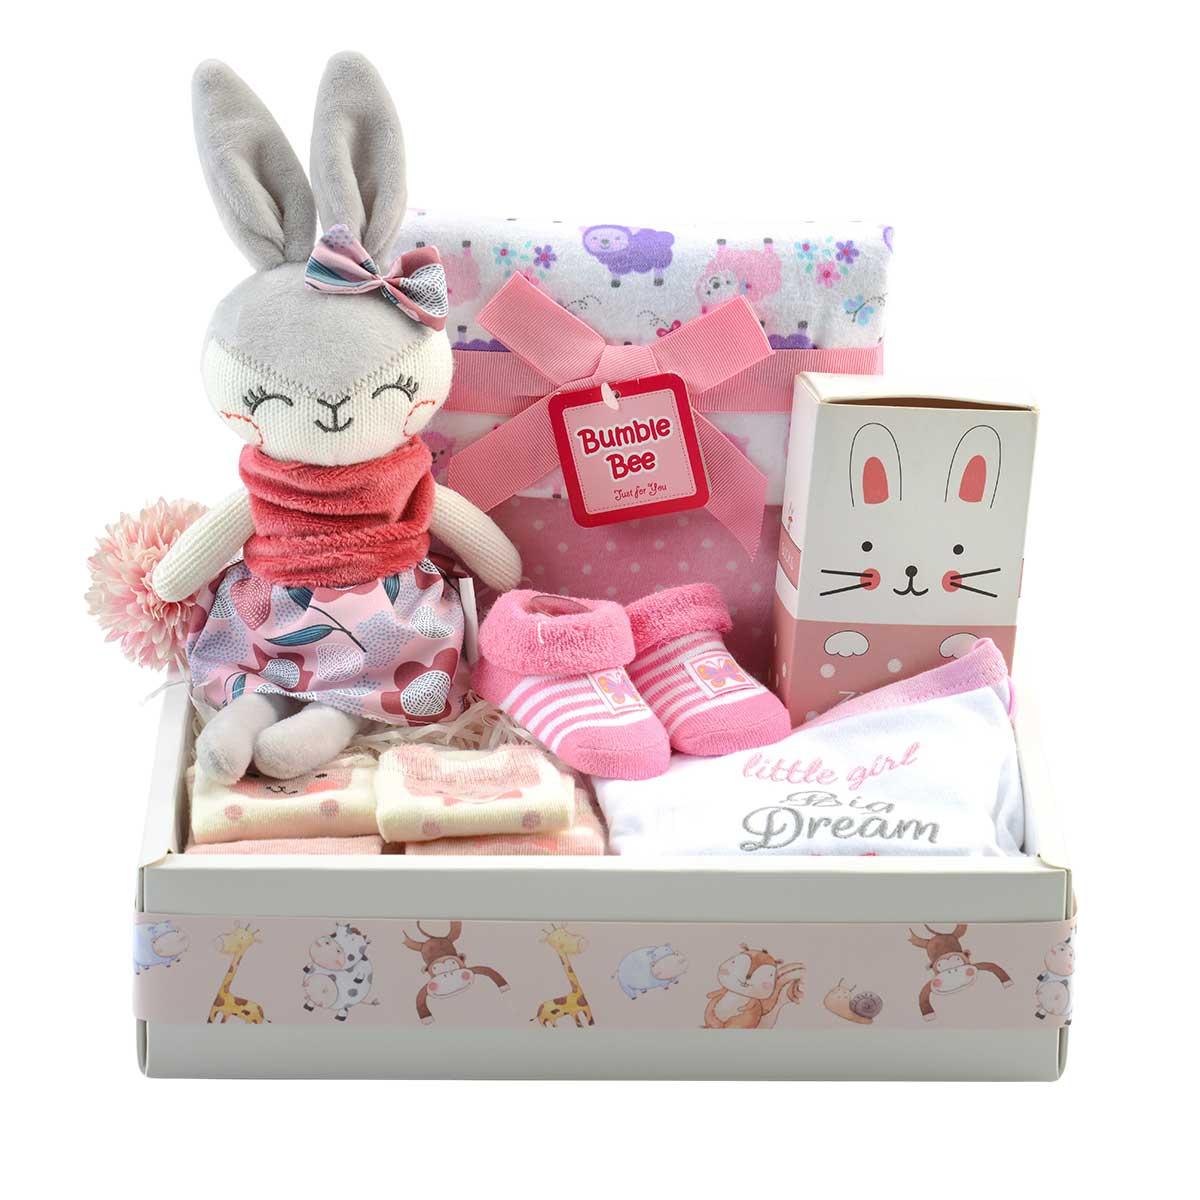 Lovely Baby Giftset | Newborn Baby Gifts | Eska Creative Gifting